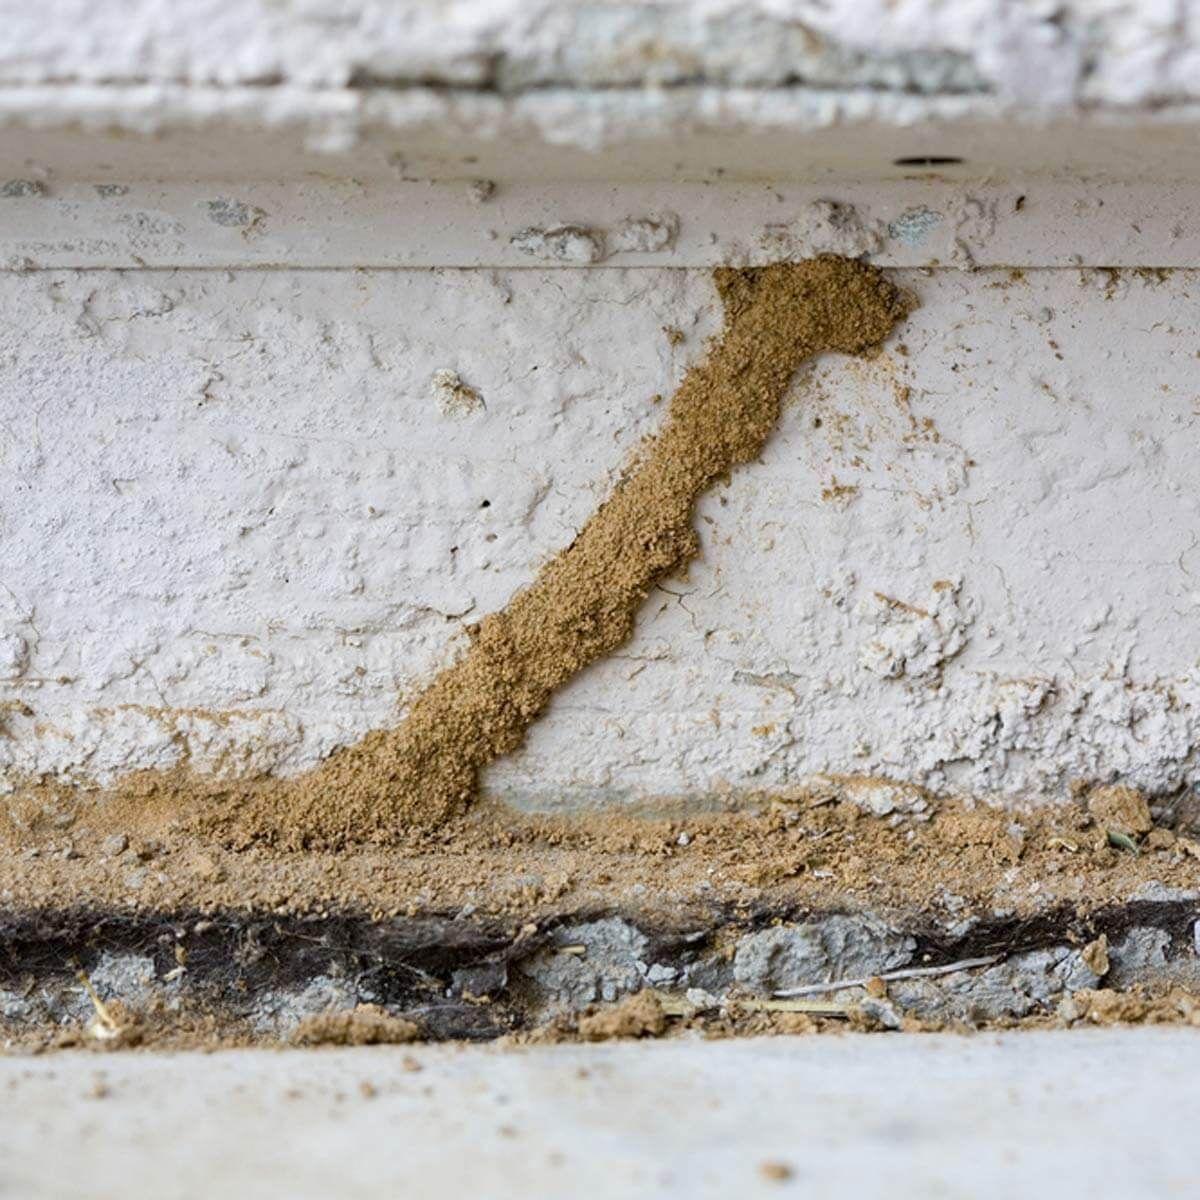 Diy Termite Control 13 Must Know Tips For Diy Termite Control Termite Inspection Termite Control Wood Termites